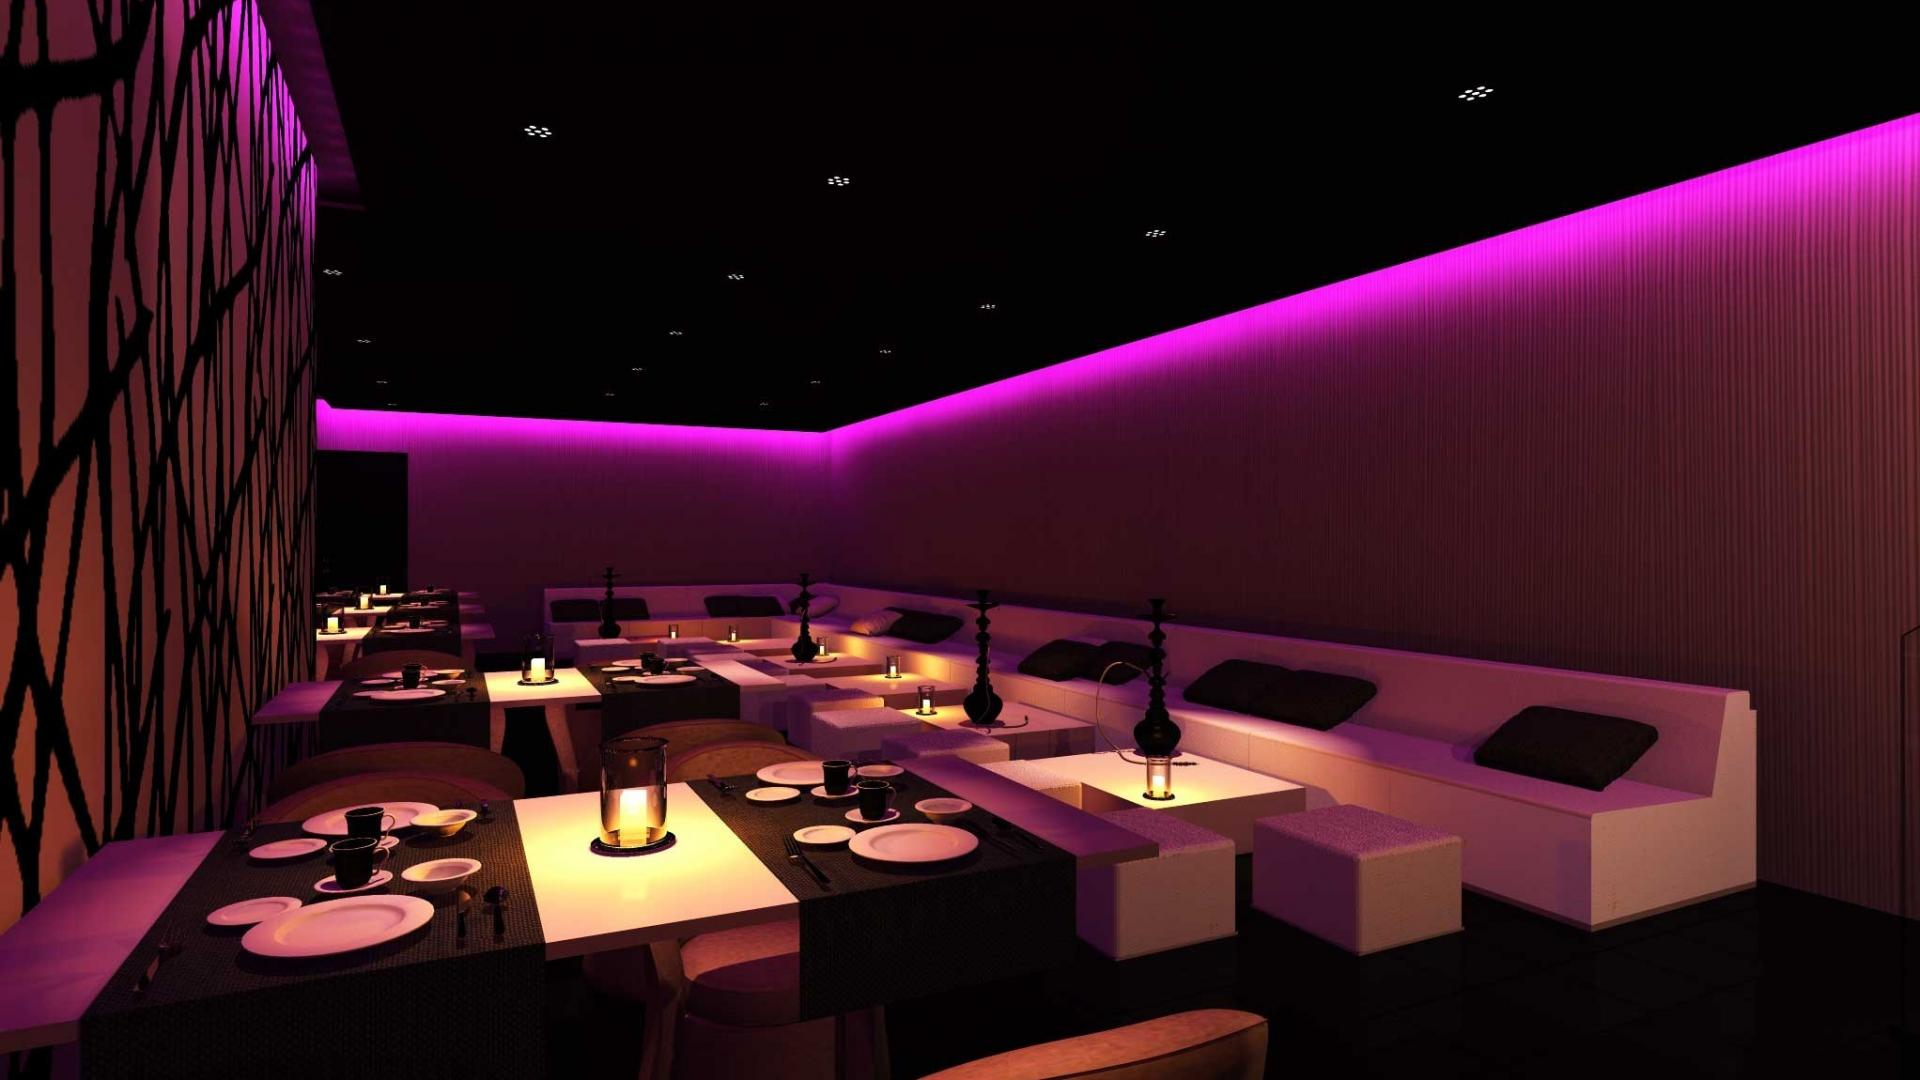 Modern Kitchen Furniture Ideas Night Club Wallpaper Wallpapersafari